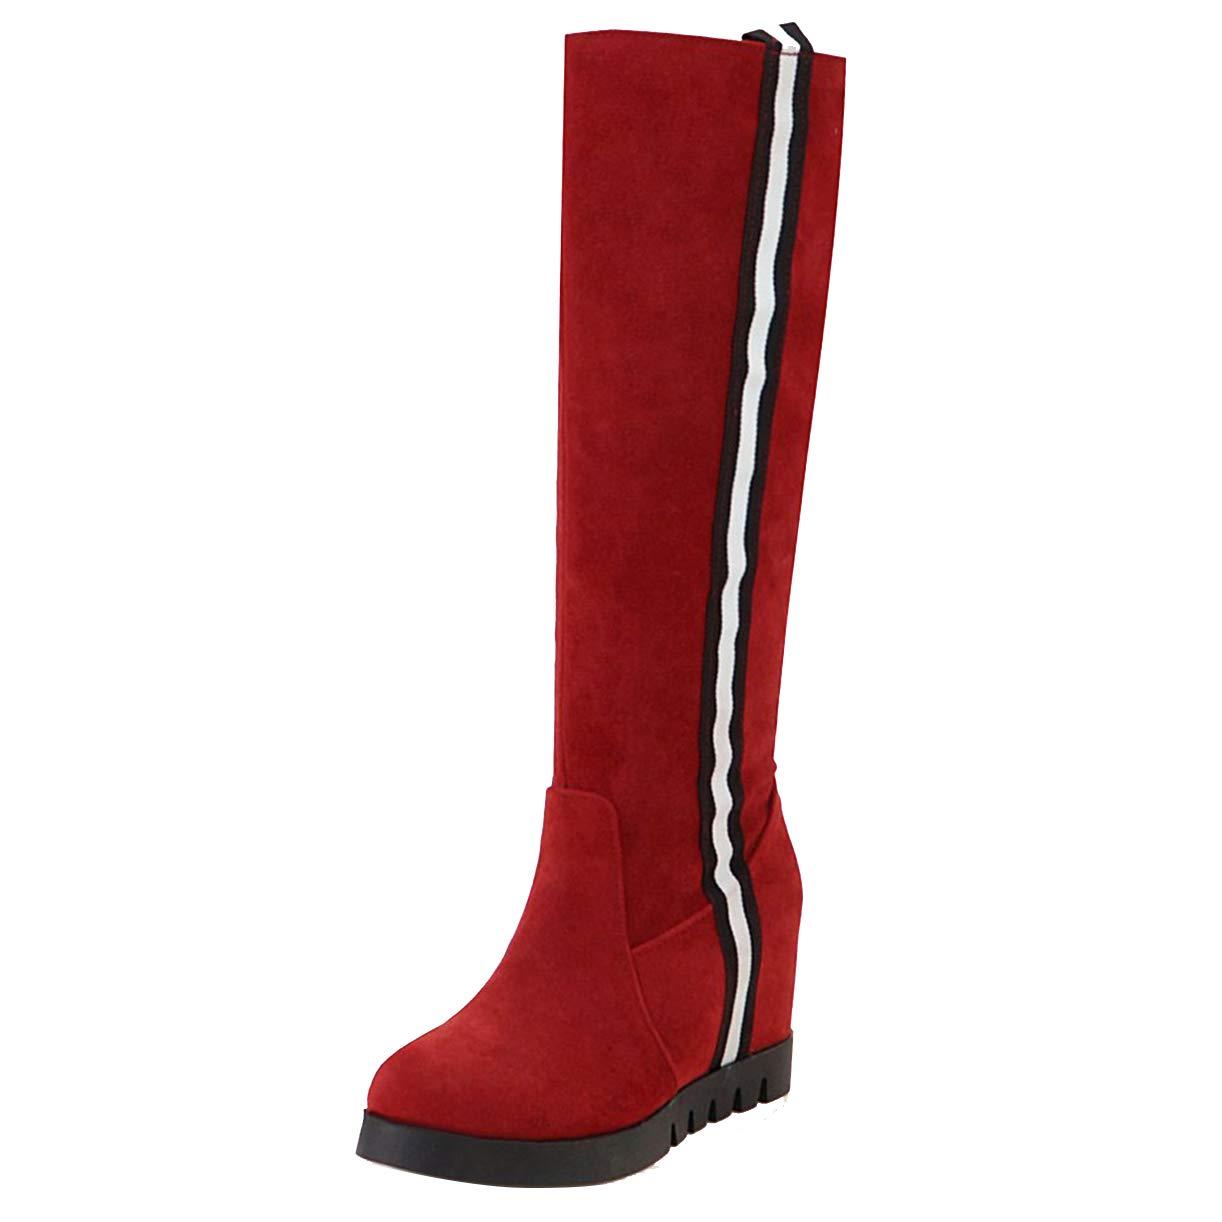 JYshoes , Rouge B01HLVC5LW Bottes Classiques JYshoes Femme Rouge 9cabab2 - shopssong.space